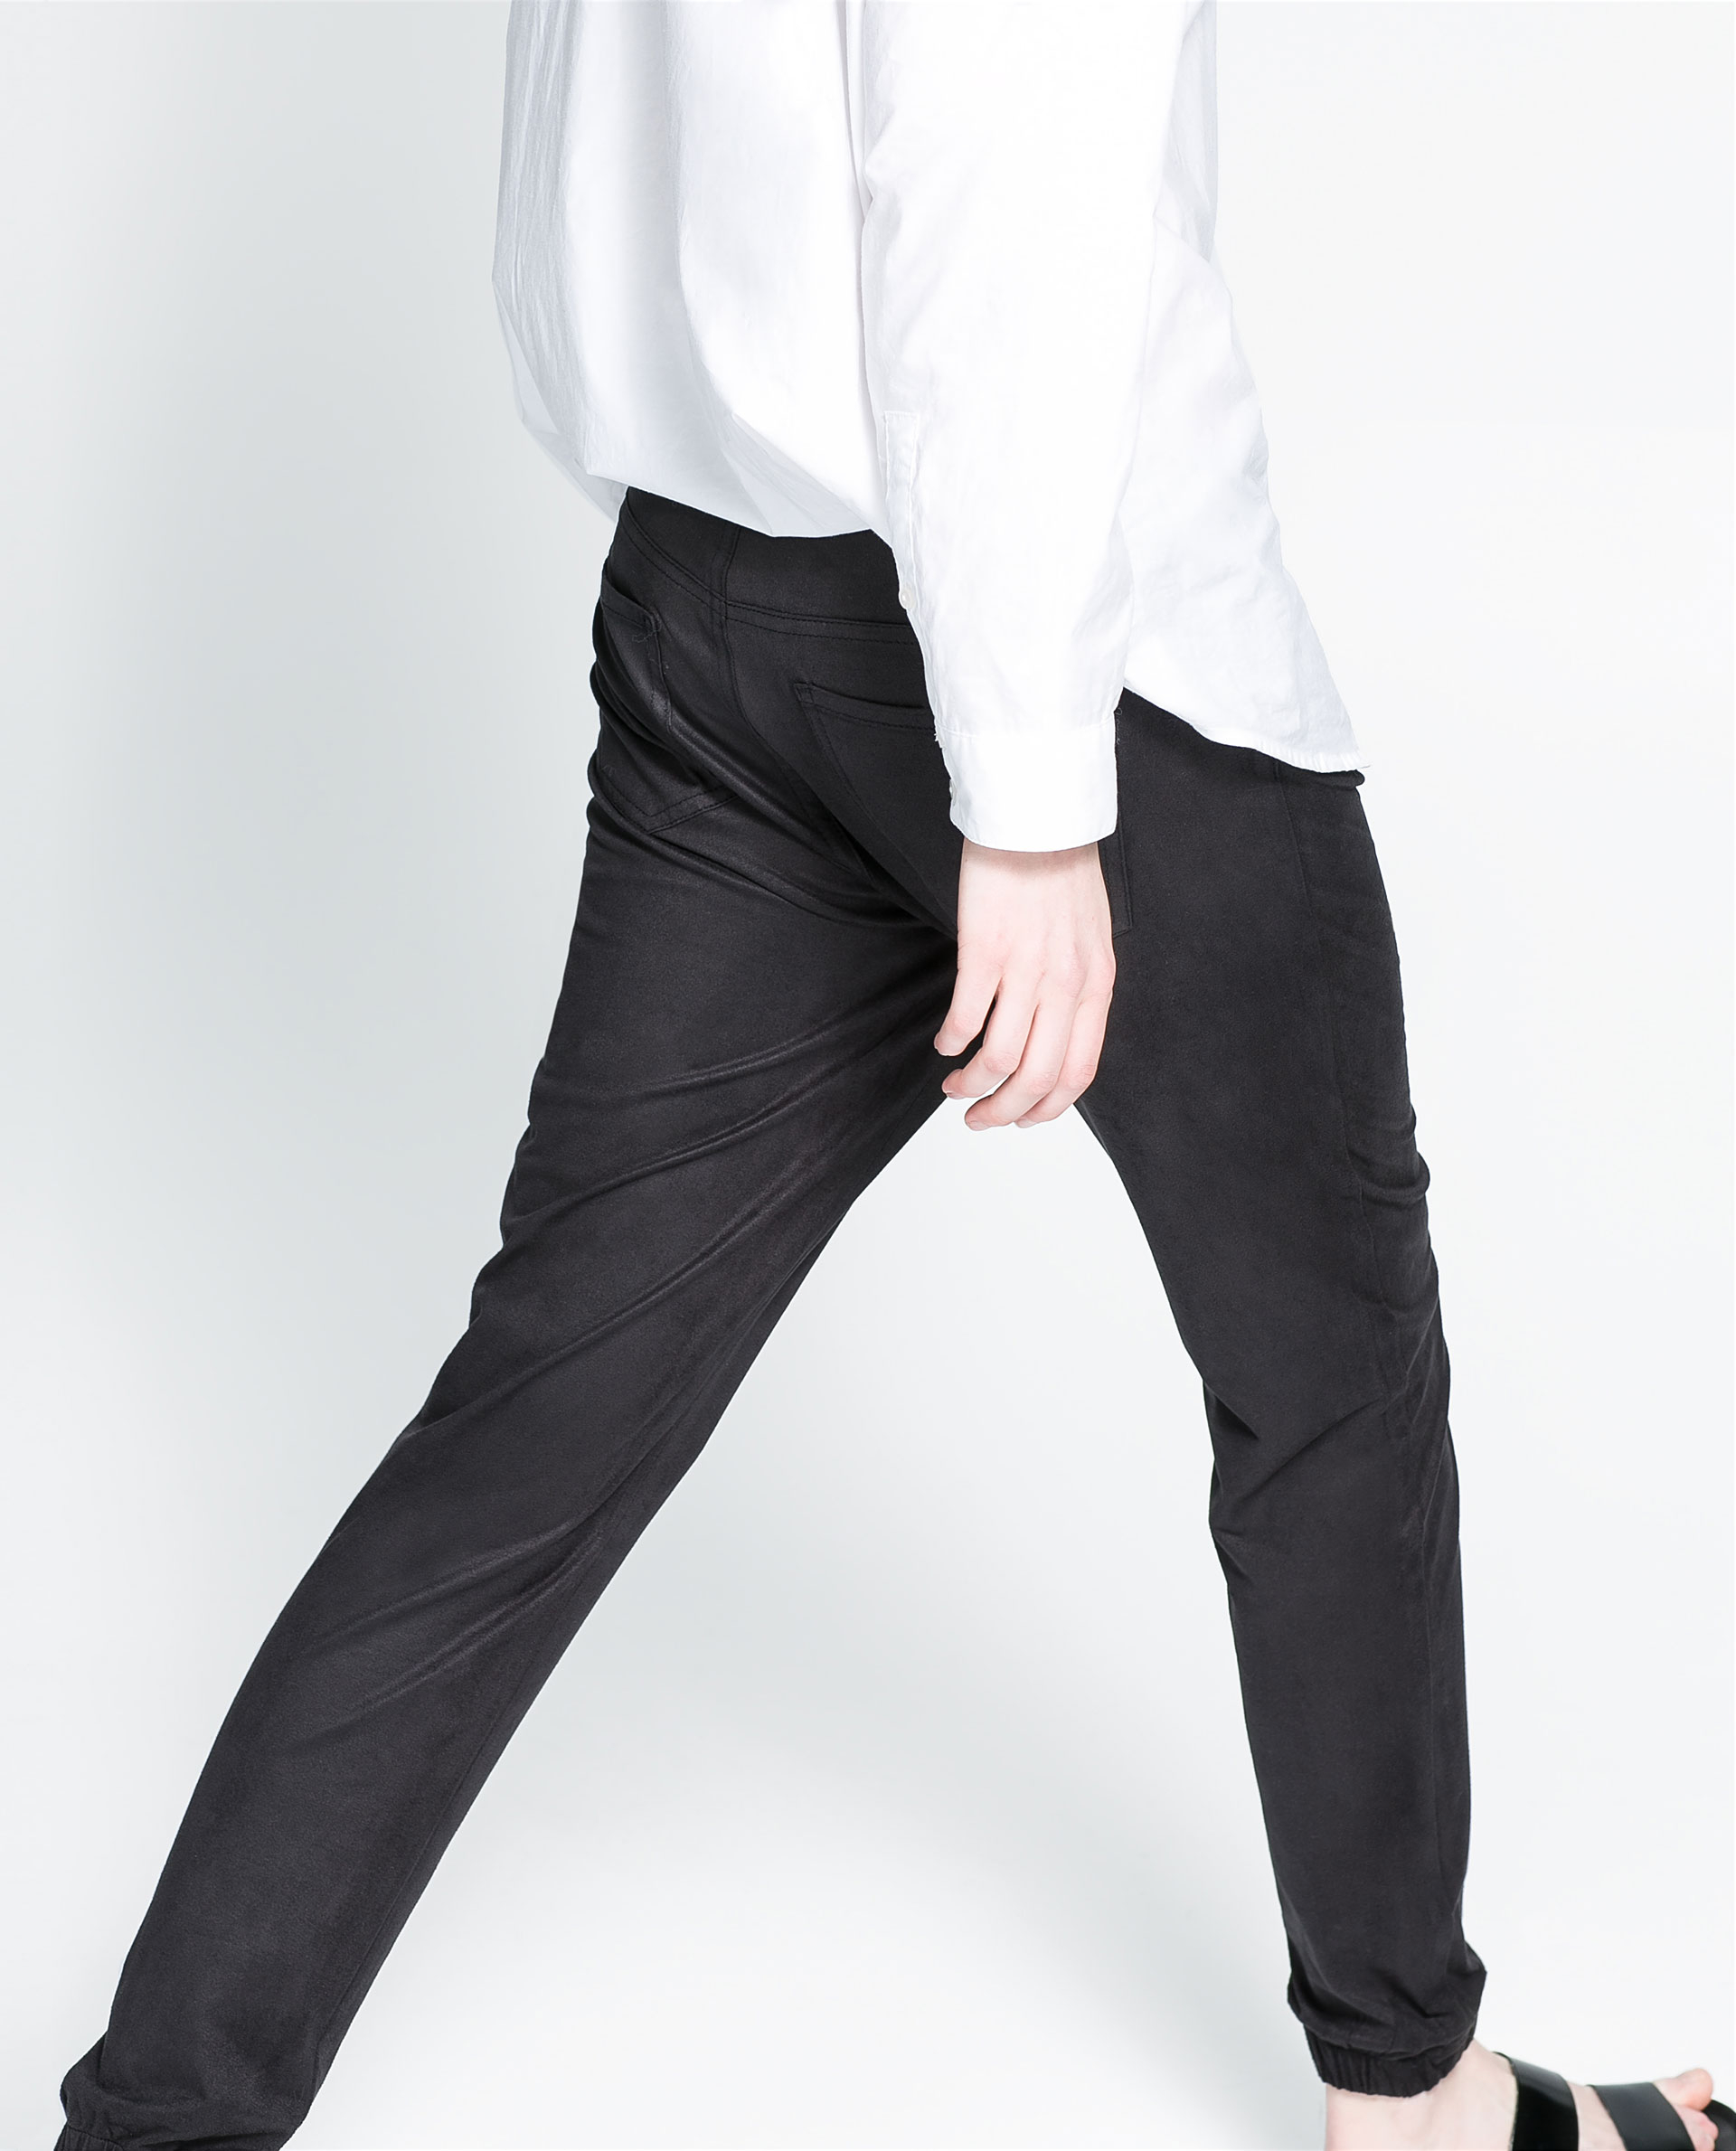 Fantastic Zara Baggy Jogging Pants In Black  Lyst